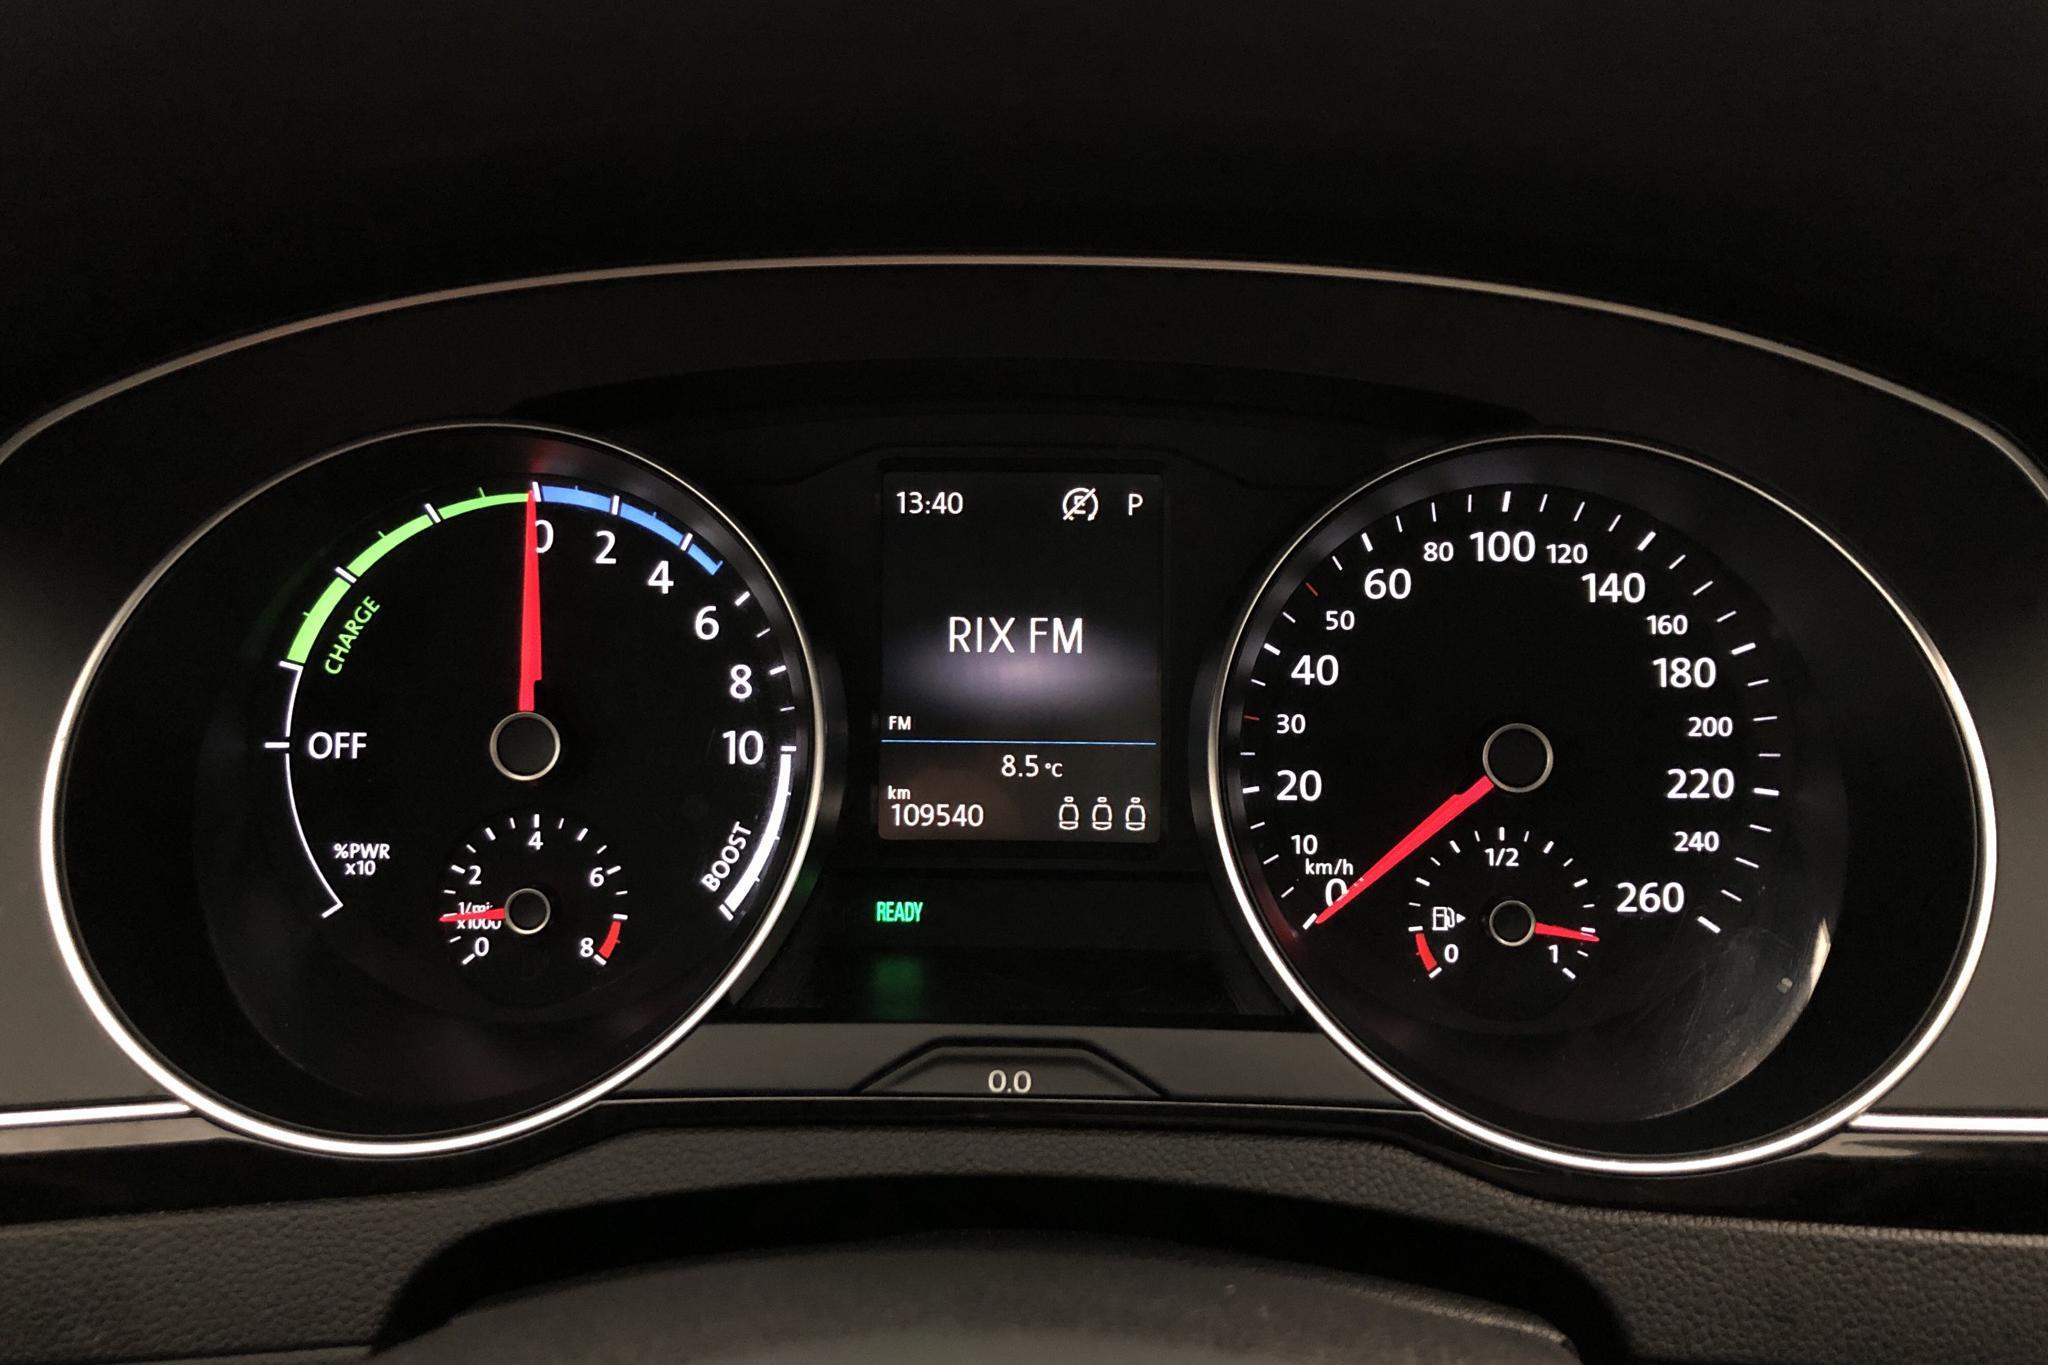 VW Passat 1.4 Plug-in-Hybrid Sportscombi (218hk) - 109 530 km - Automatic - black - 2017